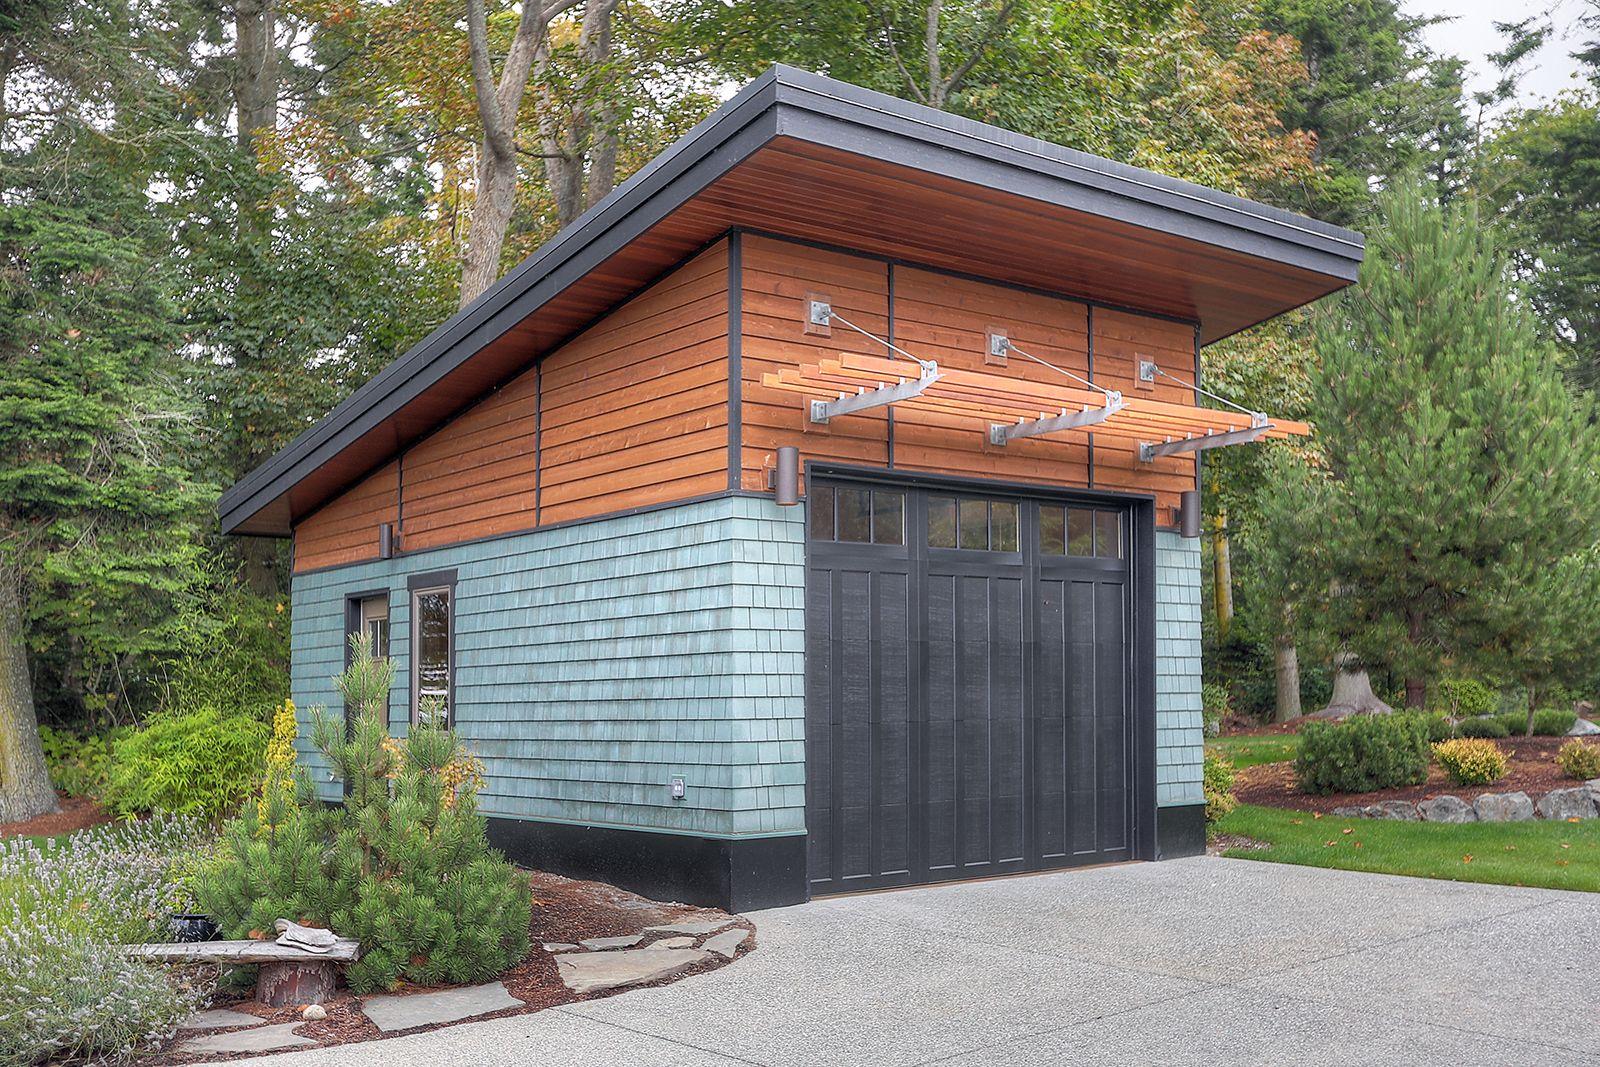 Contemporary garage Farm building design, Small house